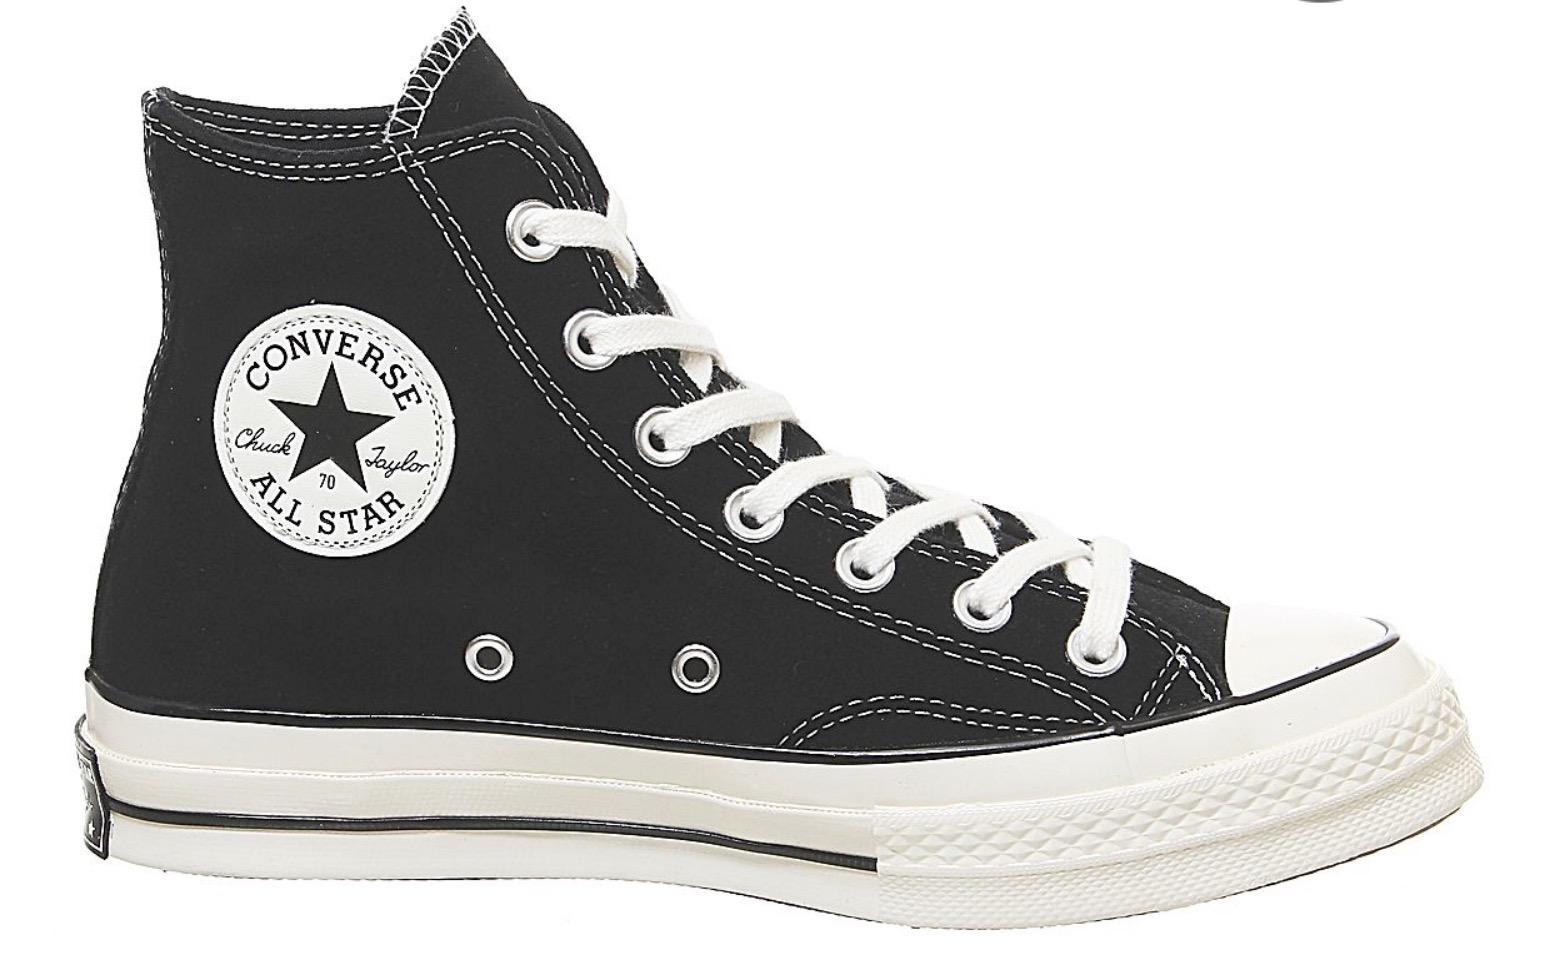 Converse Chuck Taylor 70 Black White